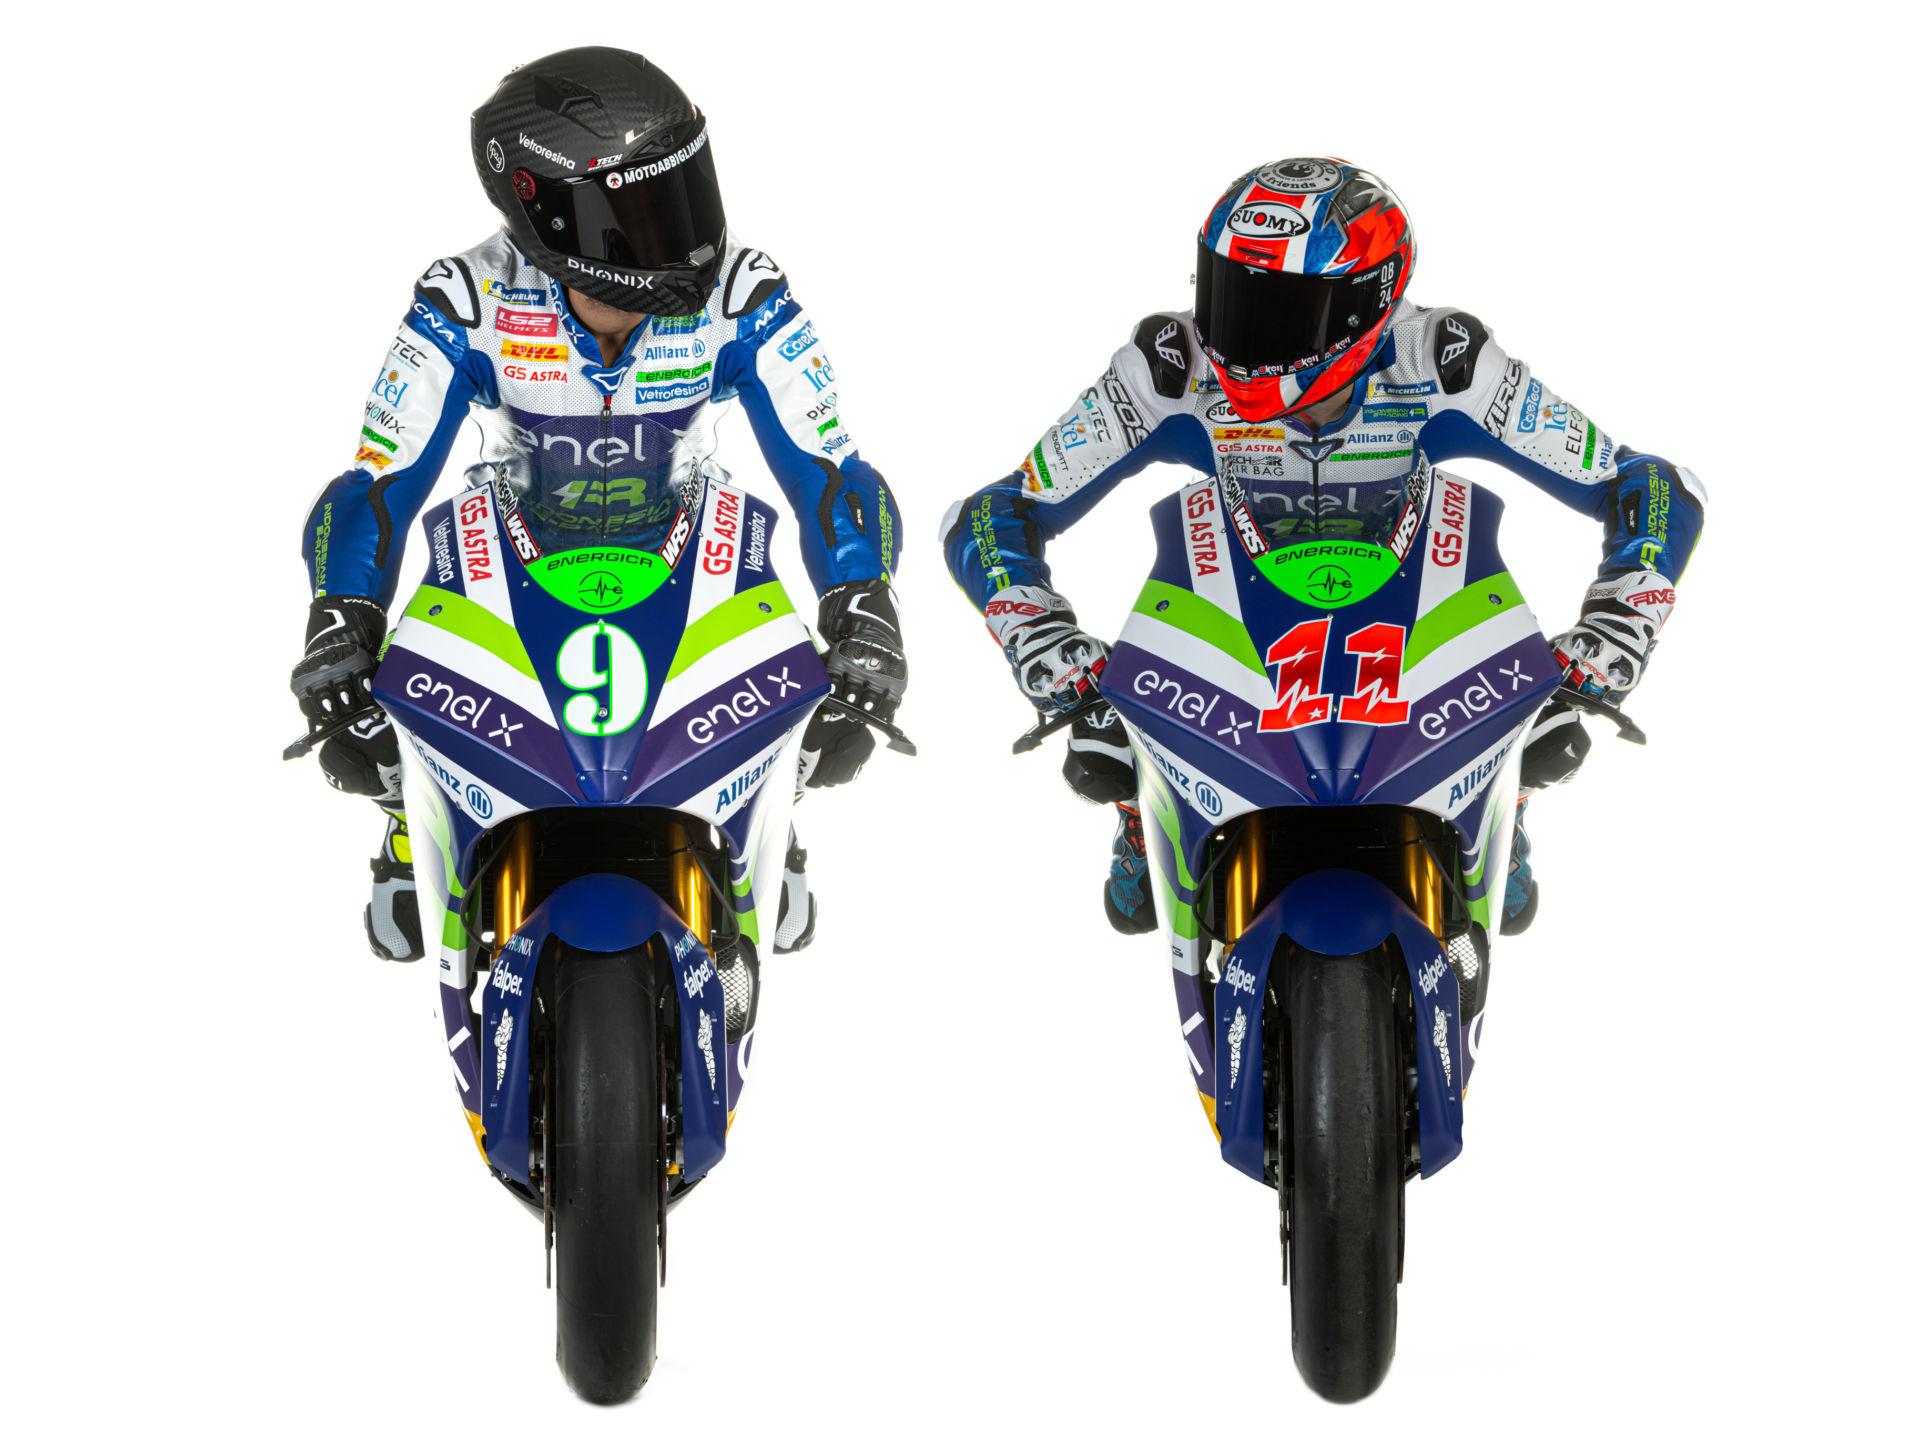 Team Gresini MotoE riders Andrea Mantovani (9) and Matteo Ferrari (11). Photo courtesy Gresini Racing.